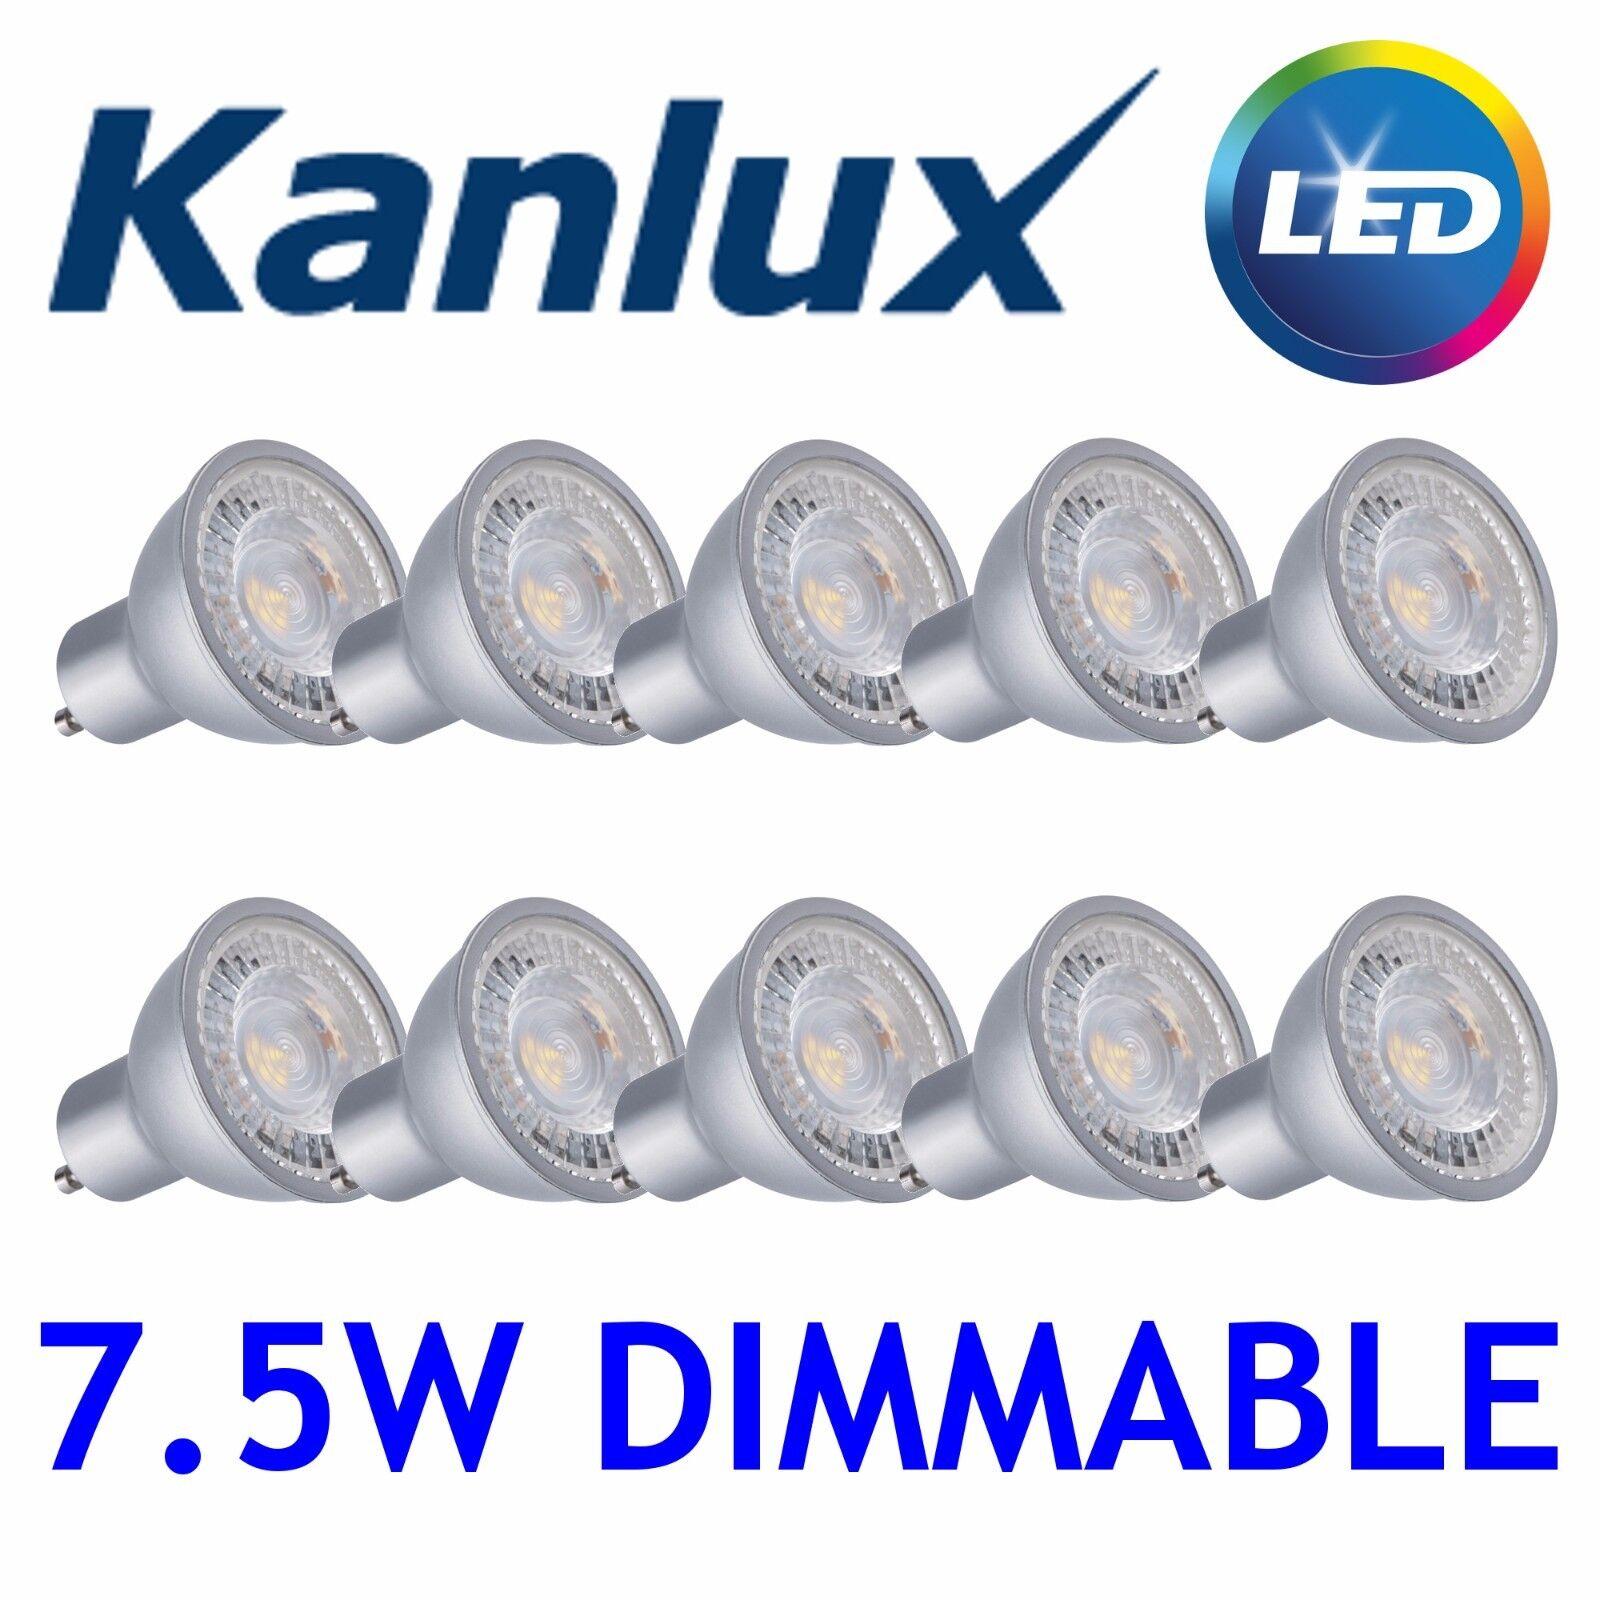 20x Kanlux PRODIM 4000K Cool blanco LED GU10 Dimmable Spot Light Bulb Lamp 7.5W